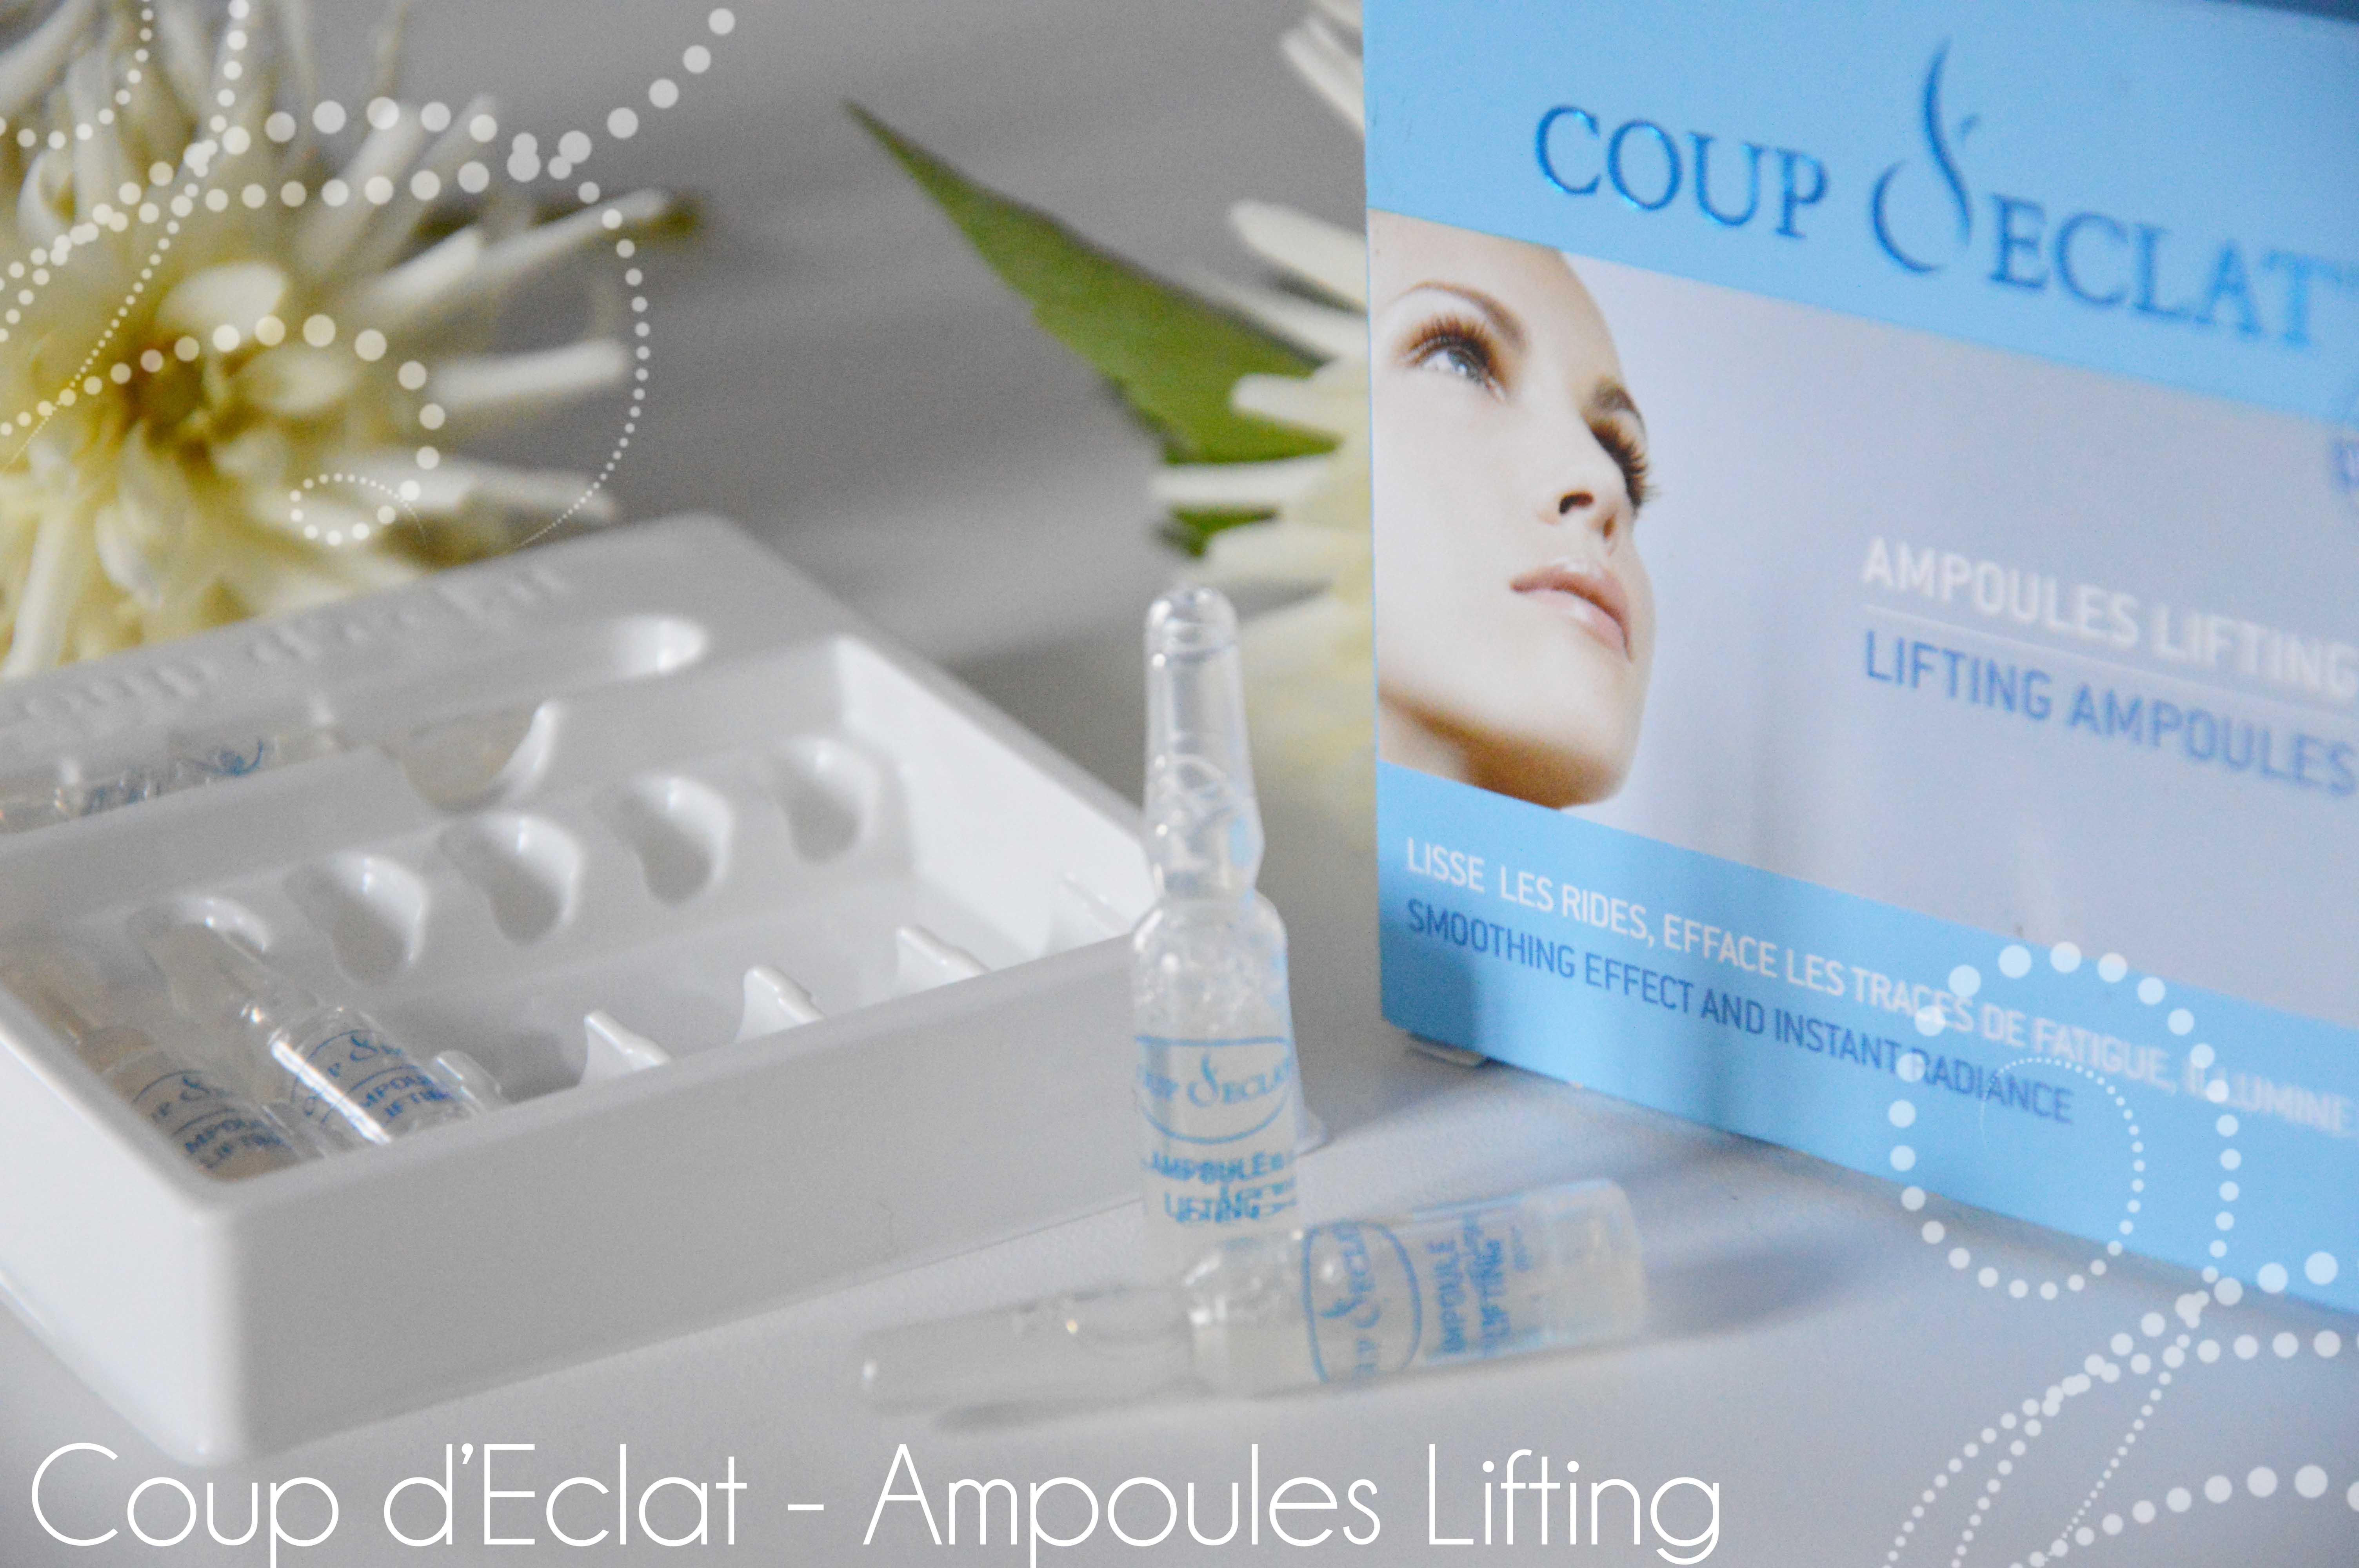 ALITTLEB_BLOG_BEAUTE_TEINT_ECLATANT_COUP_DECLAT_AMPOULES_LIFTING